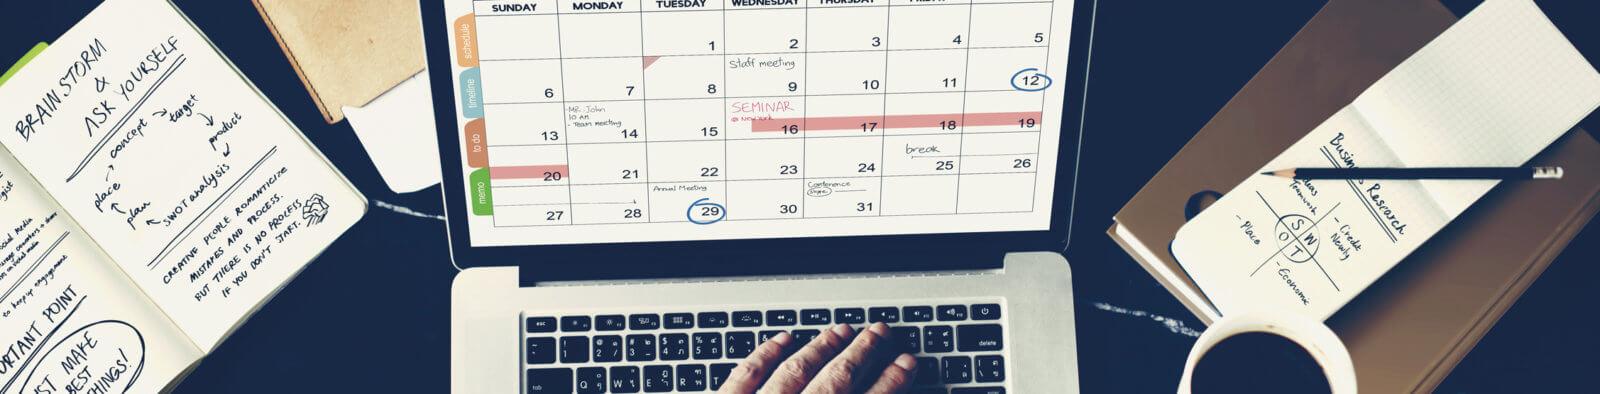 Days Months Dates in English